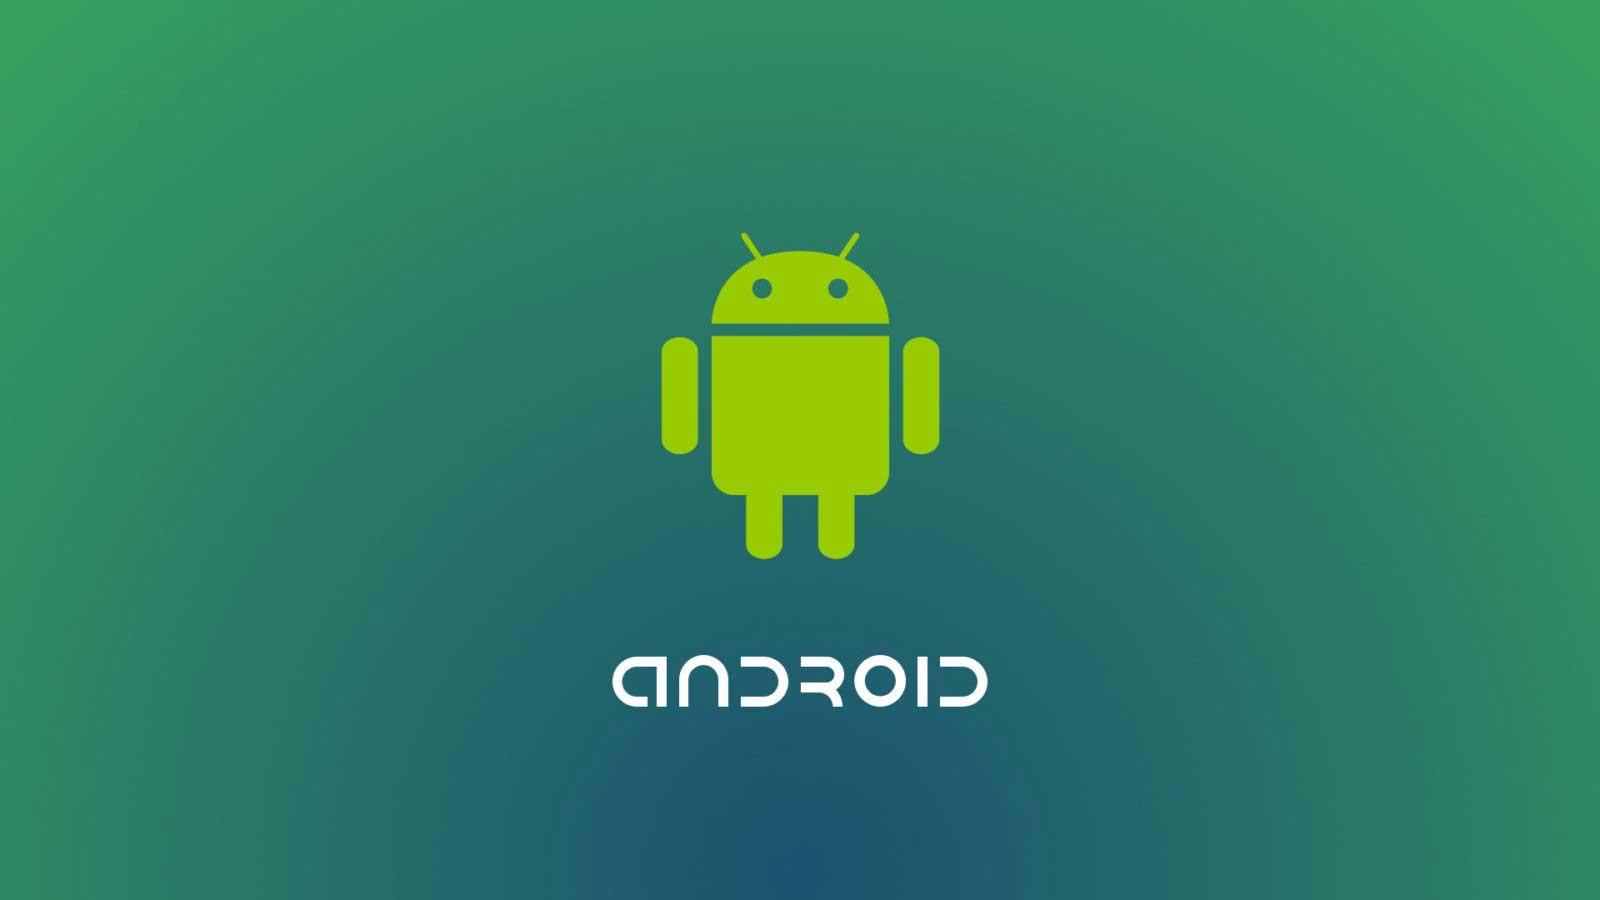 Разработка приложений под Android в Ставрополе